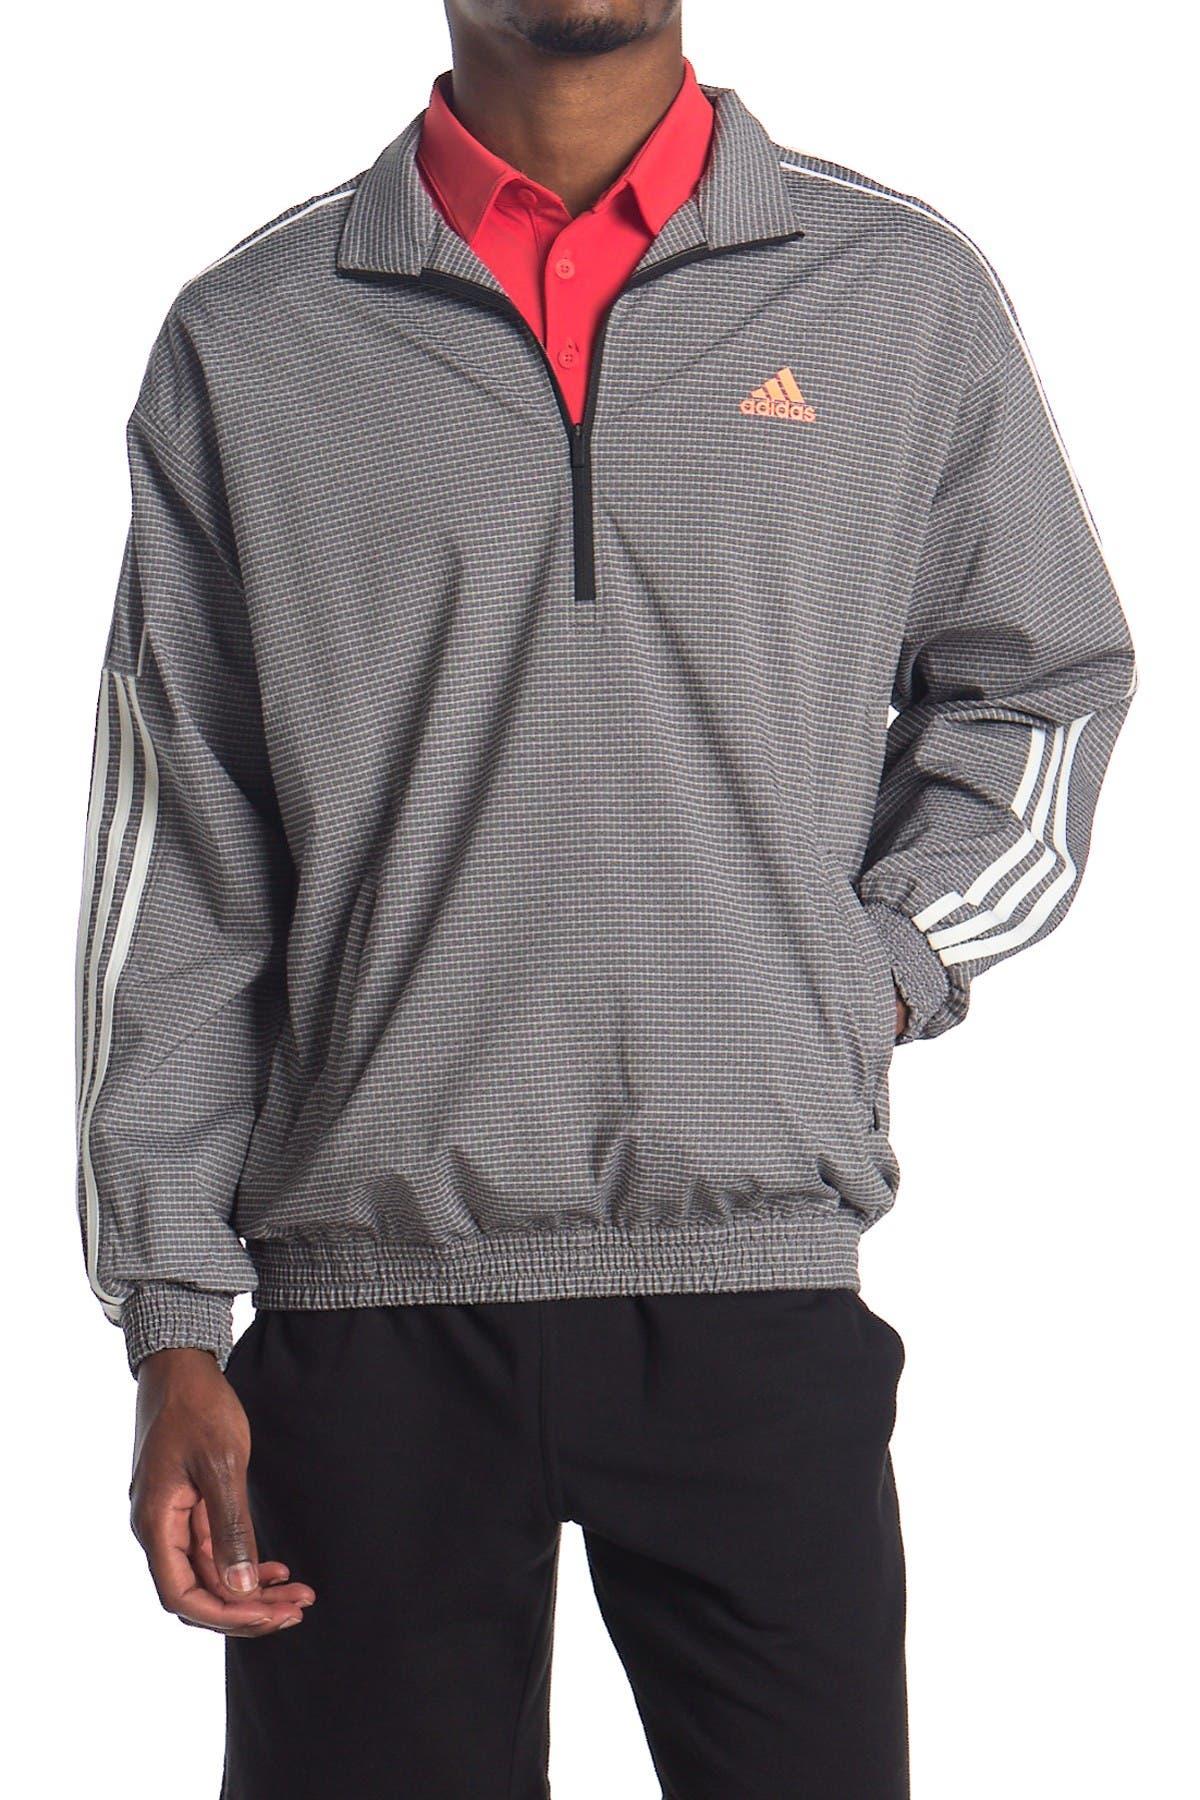 Adidas 3 Stripe Golf Jacket